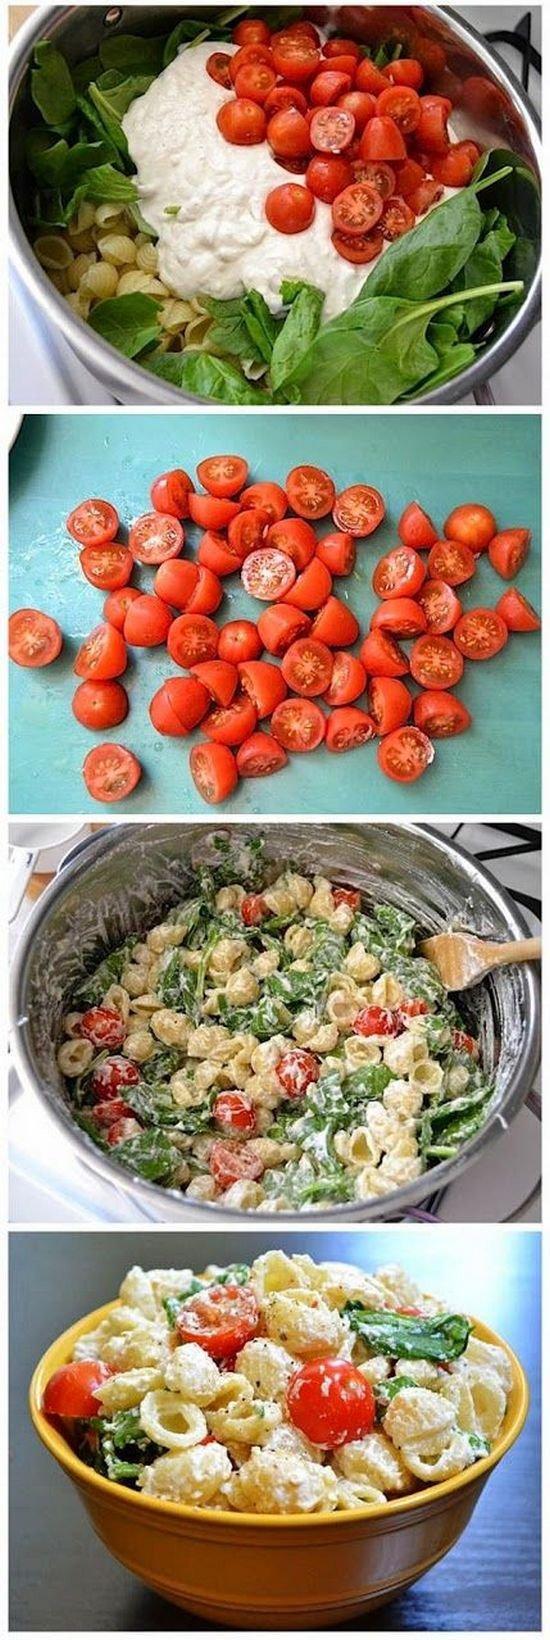 dish,food,cuisine,meal,fish,